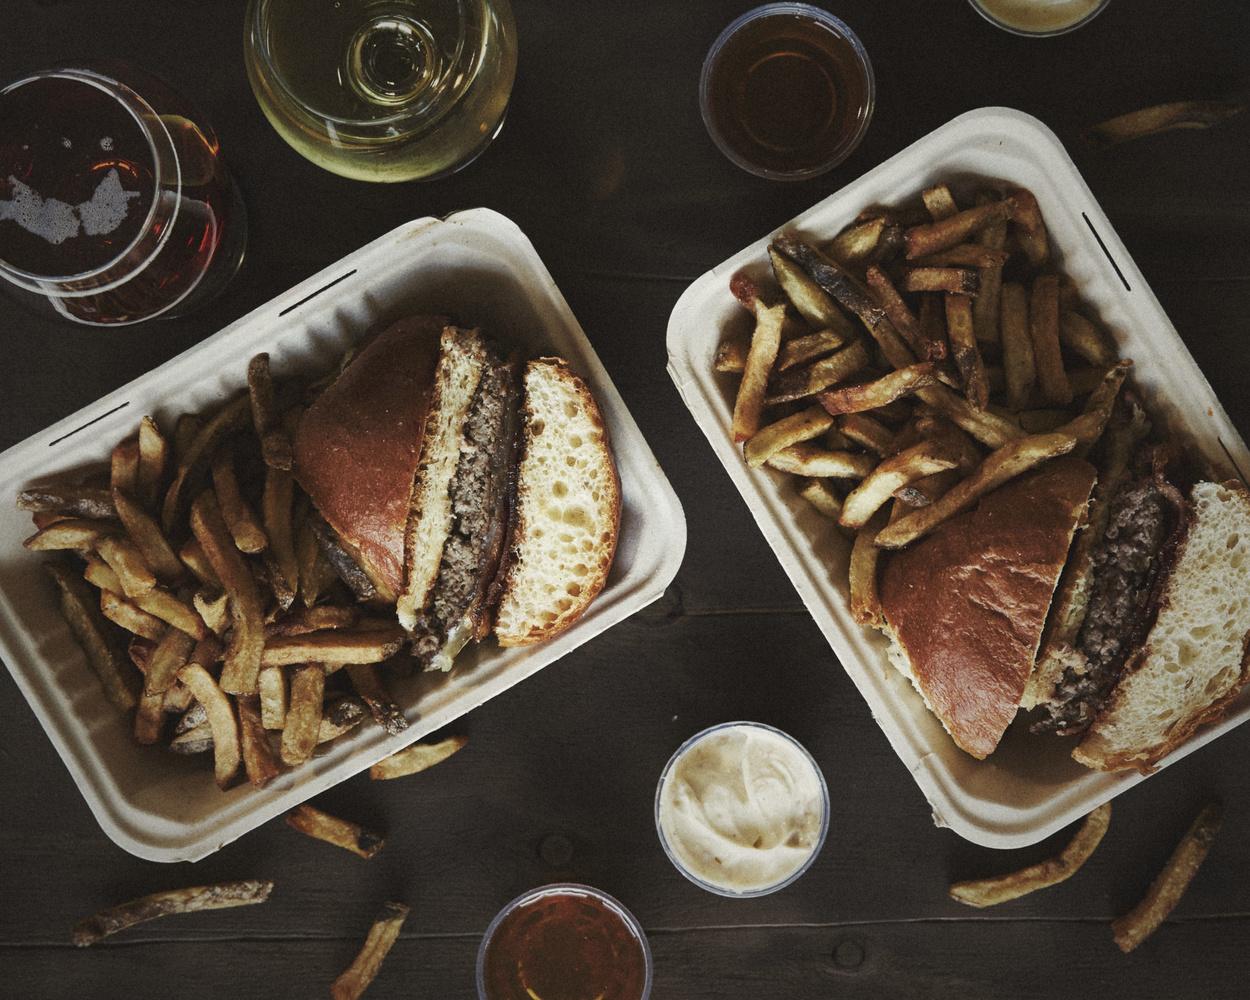 Curb to Table | Grind Burger by Gary Barragan